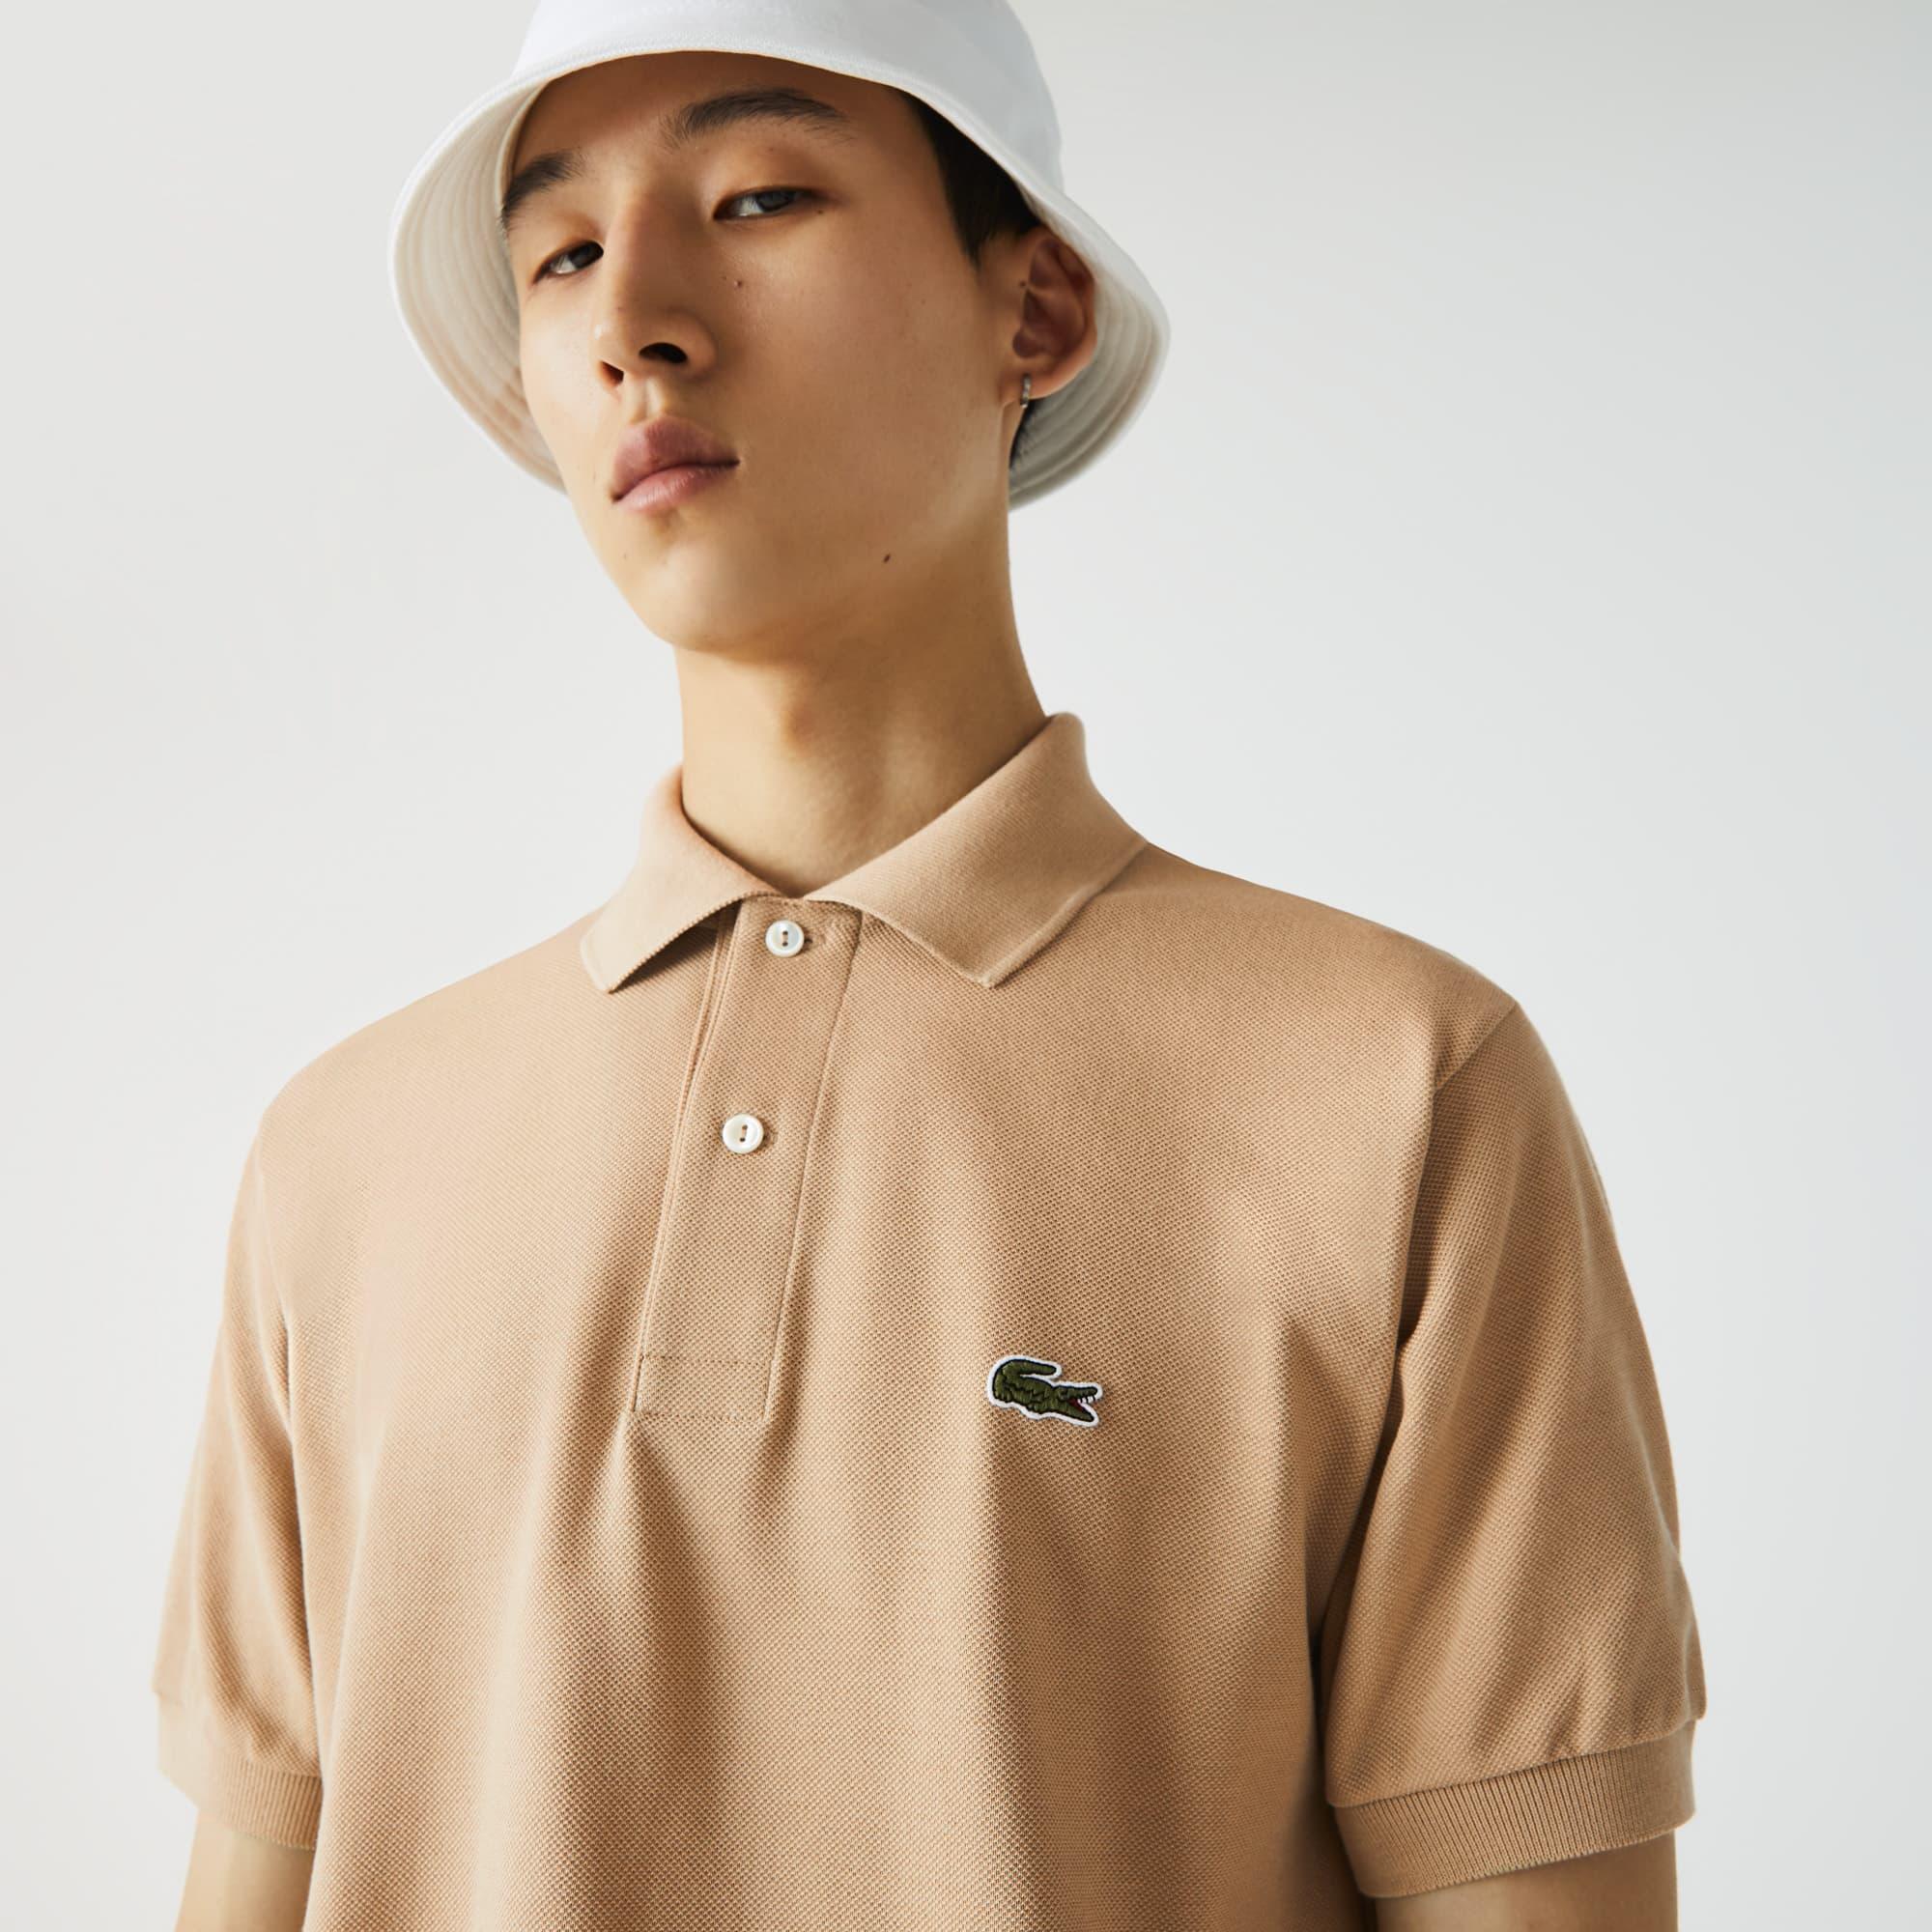 ac9abbb559 Camisas polo para homens